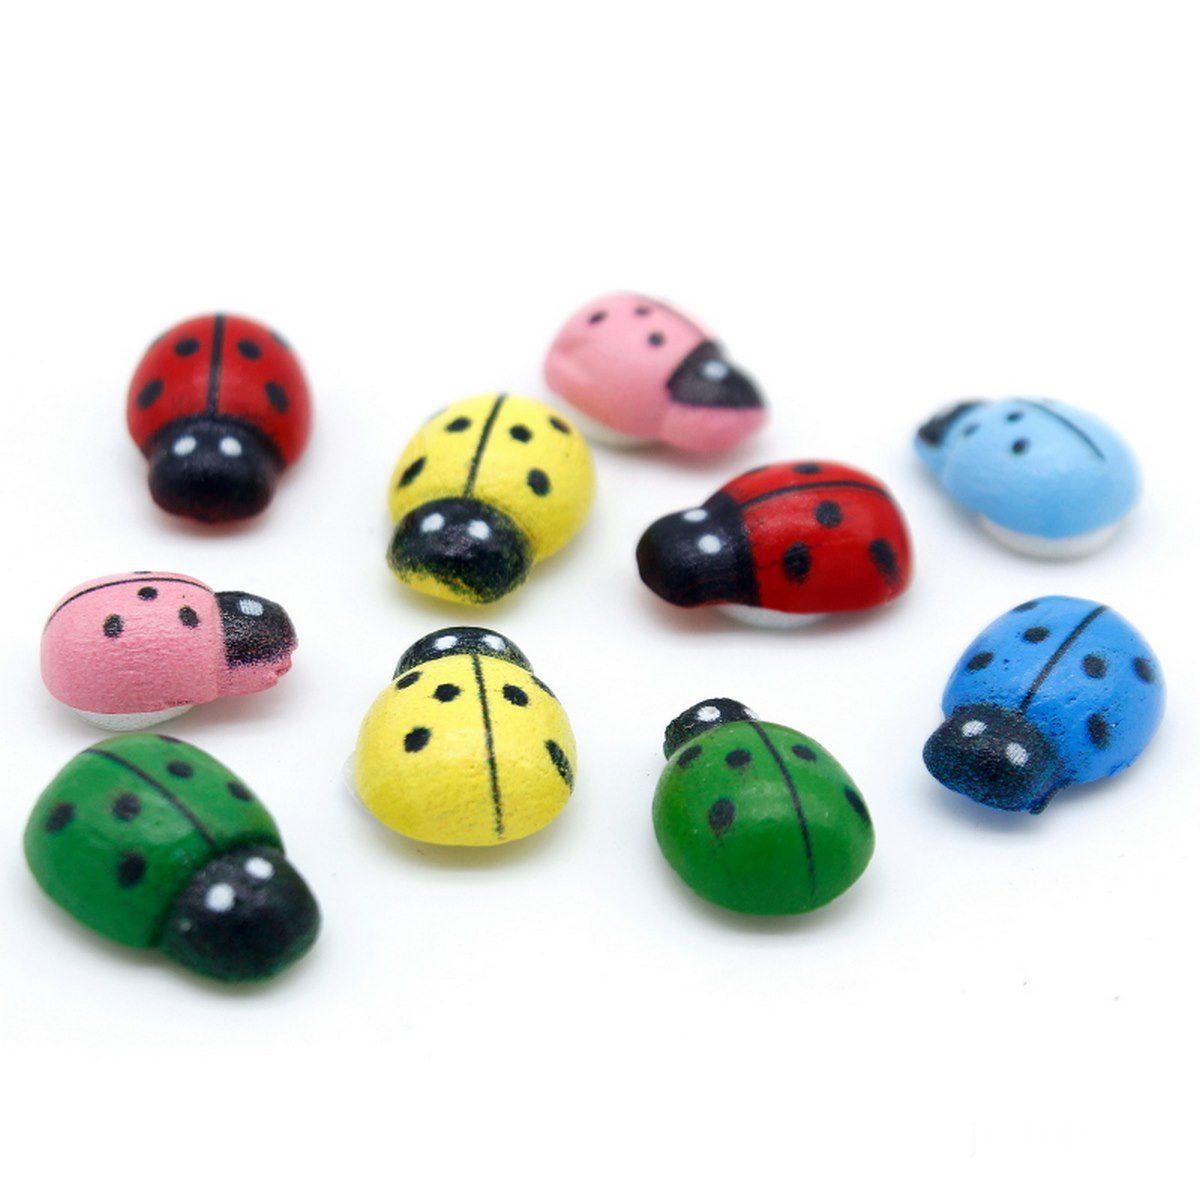 Miniature Lady Bugs